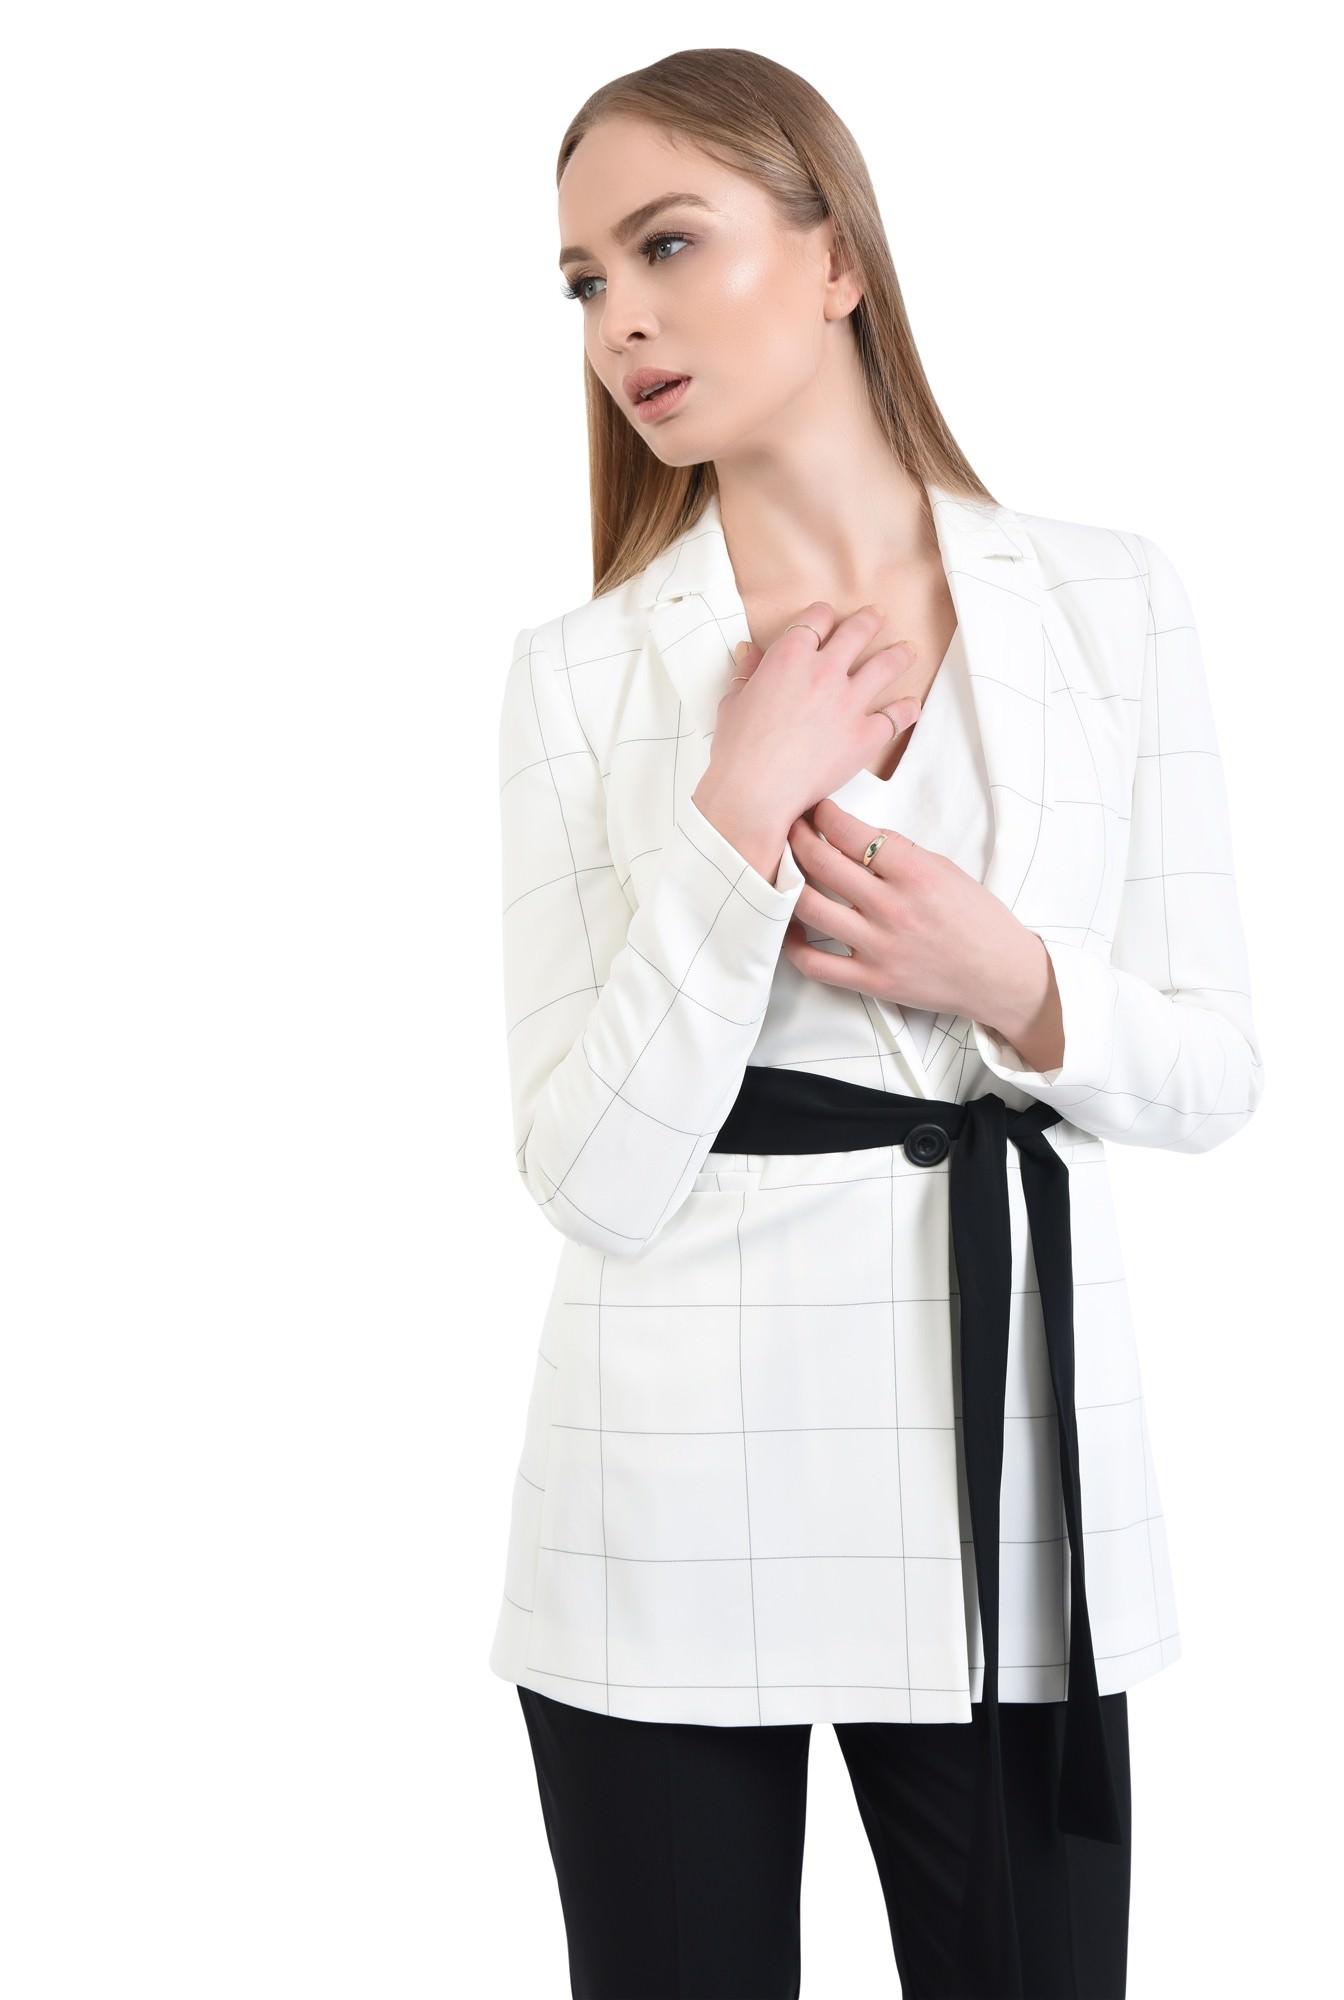 0 - Sacou elegant, alb